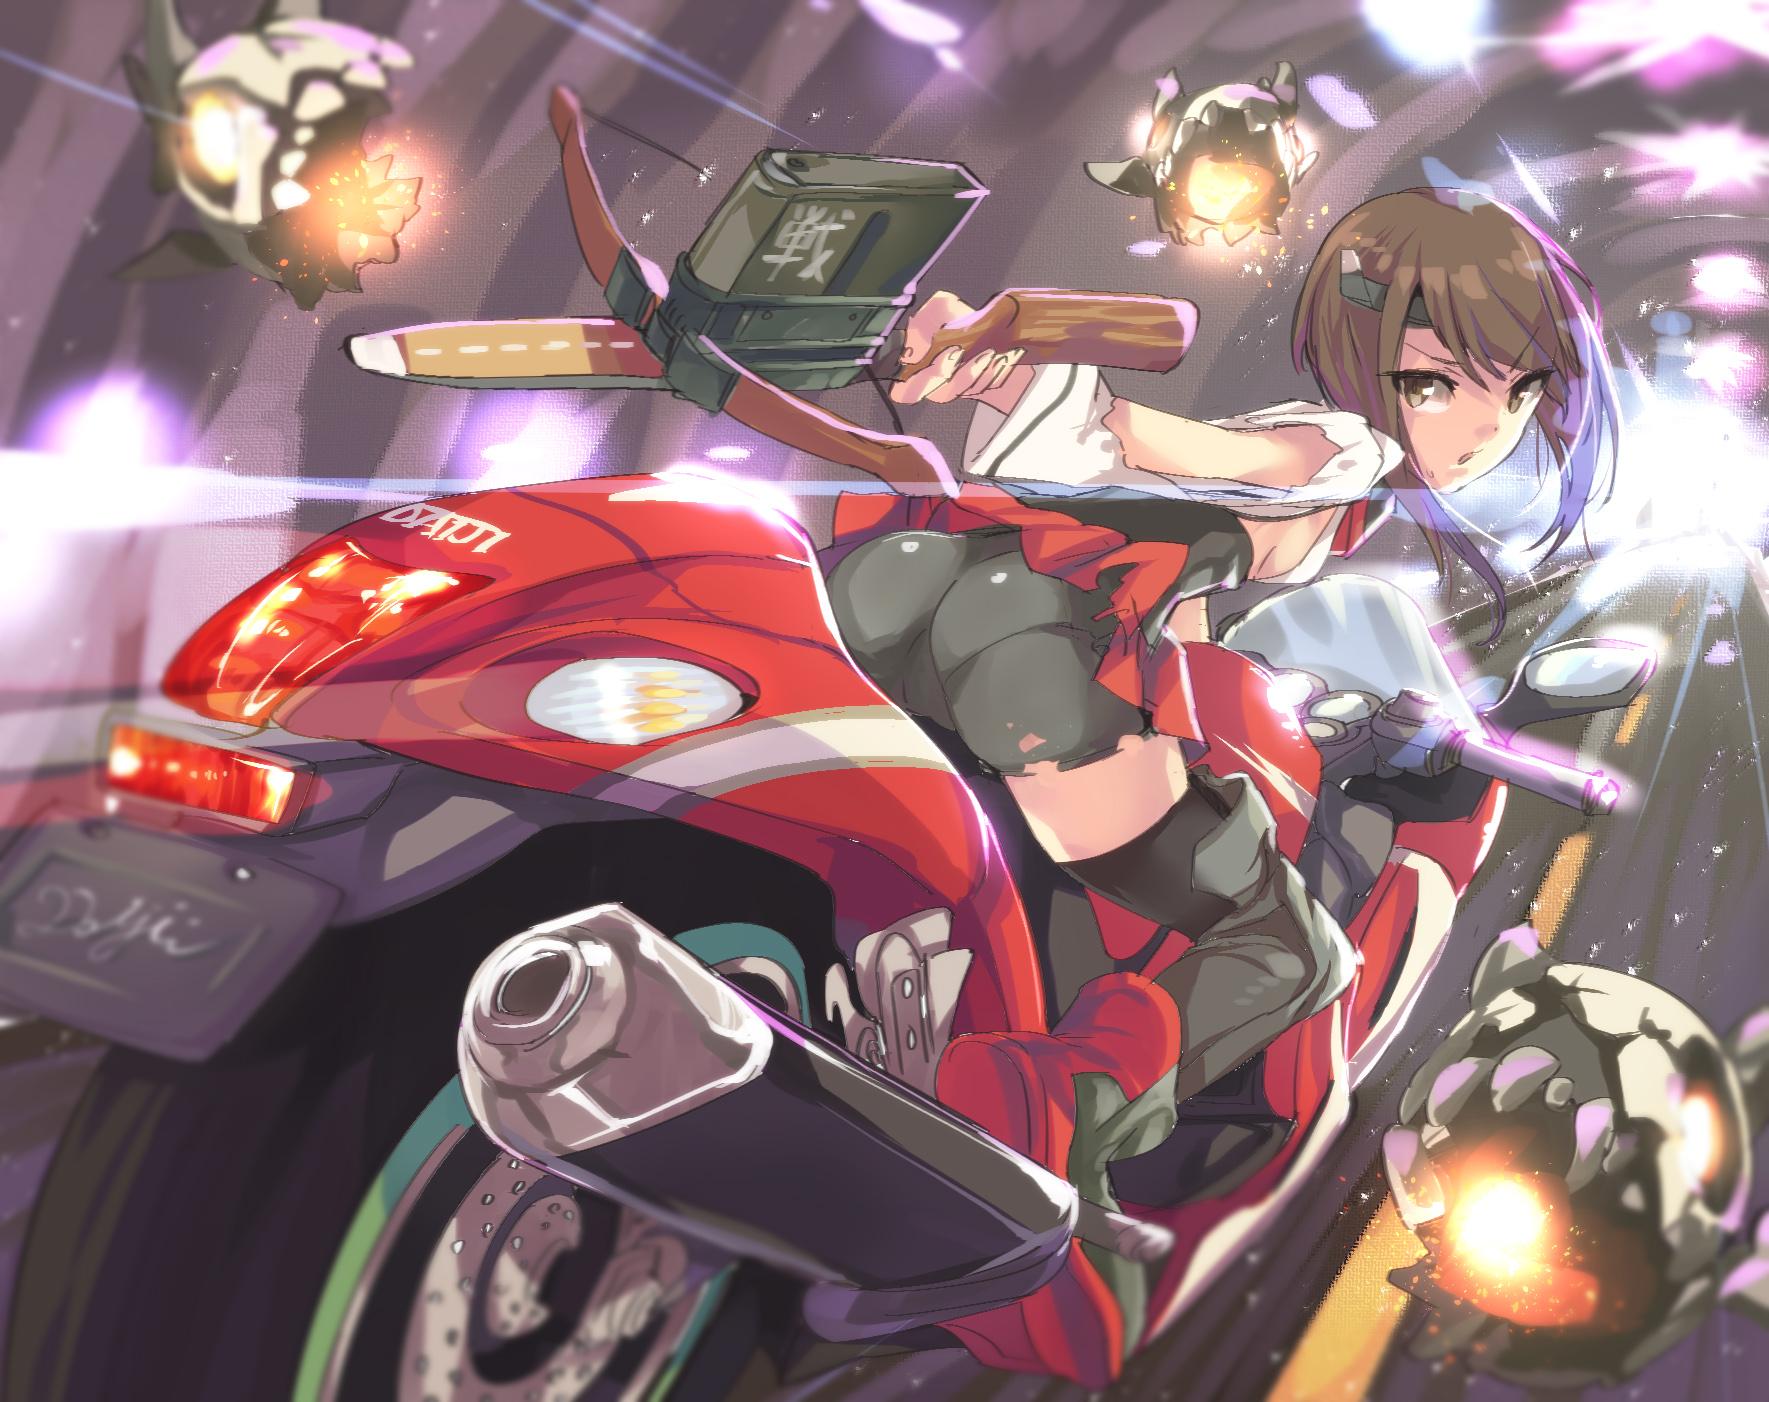 Anthropomorphism Ass Kantai Collection Motorcycle Satou Daiji Taihou Kancolle Thighhighs Weapon Konachan Com Konachan Com Anime Wallpapers